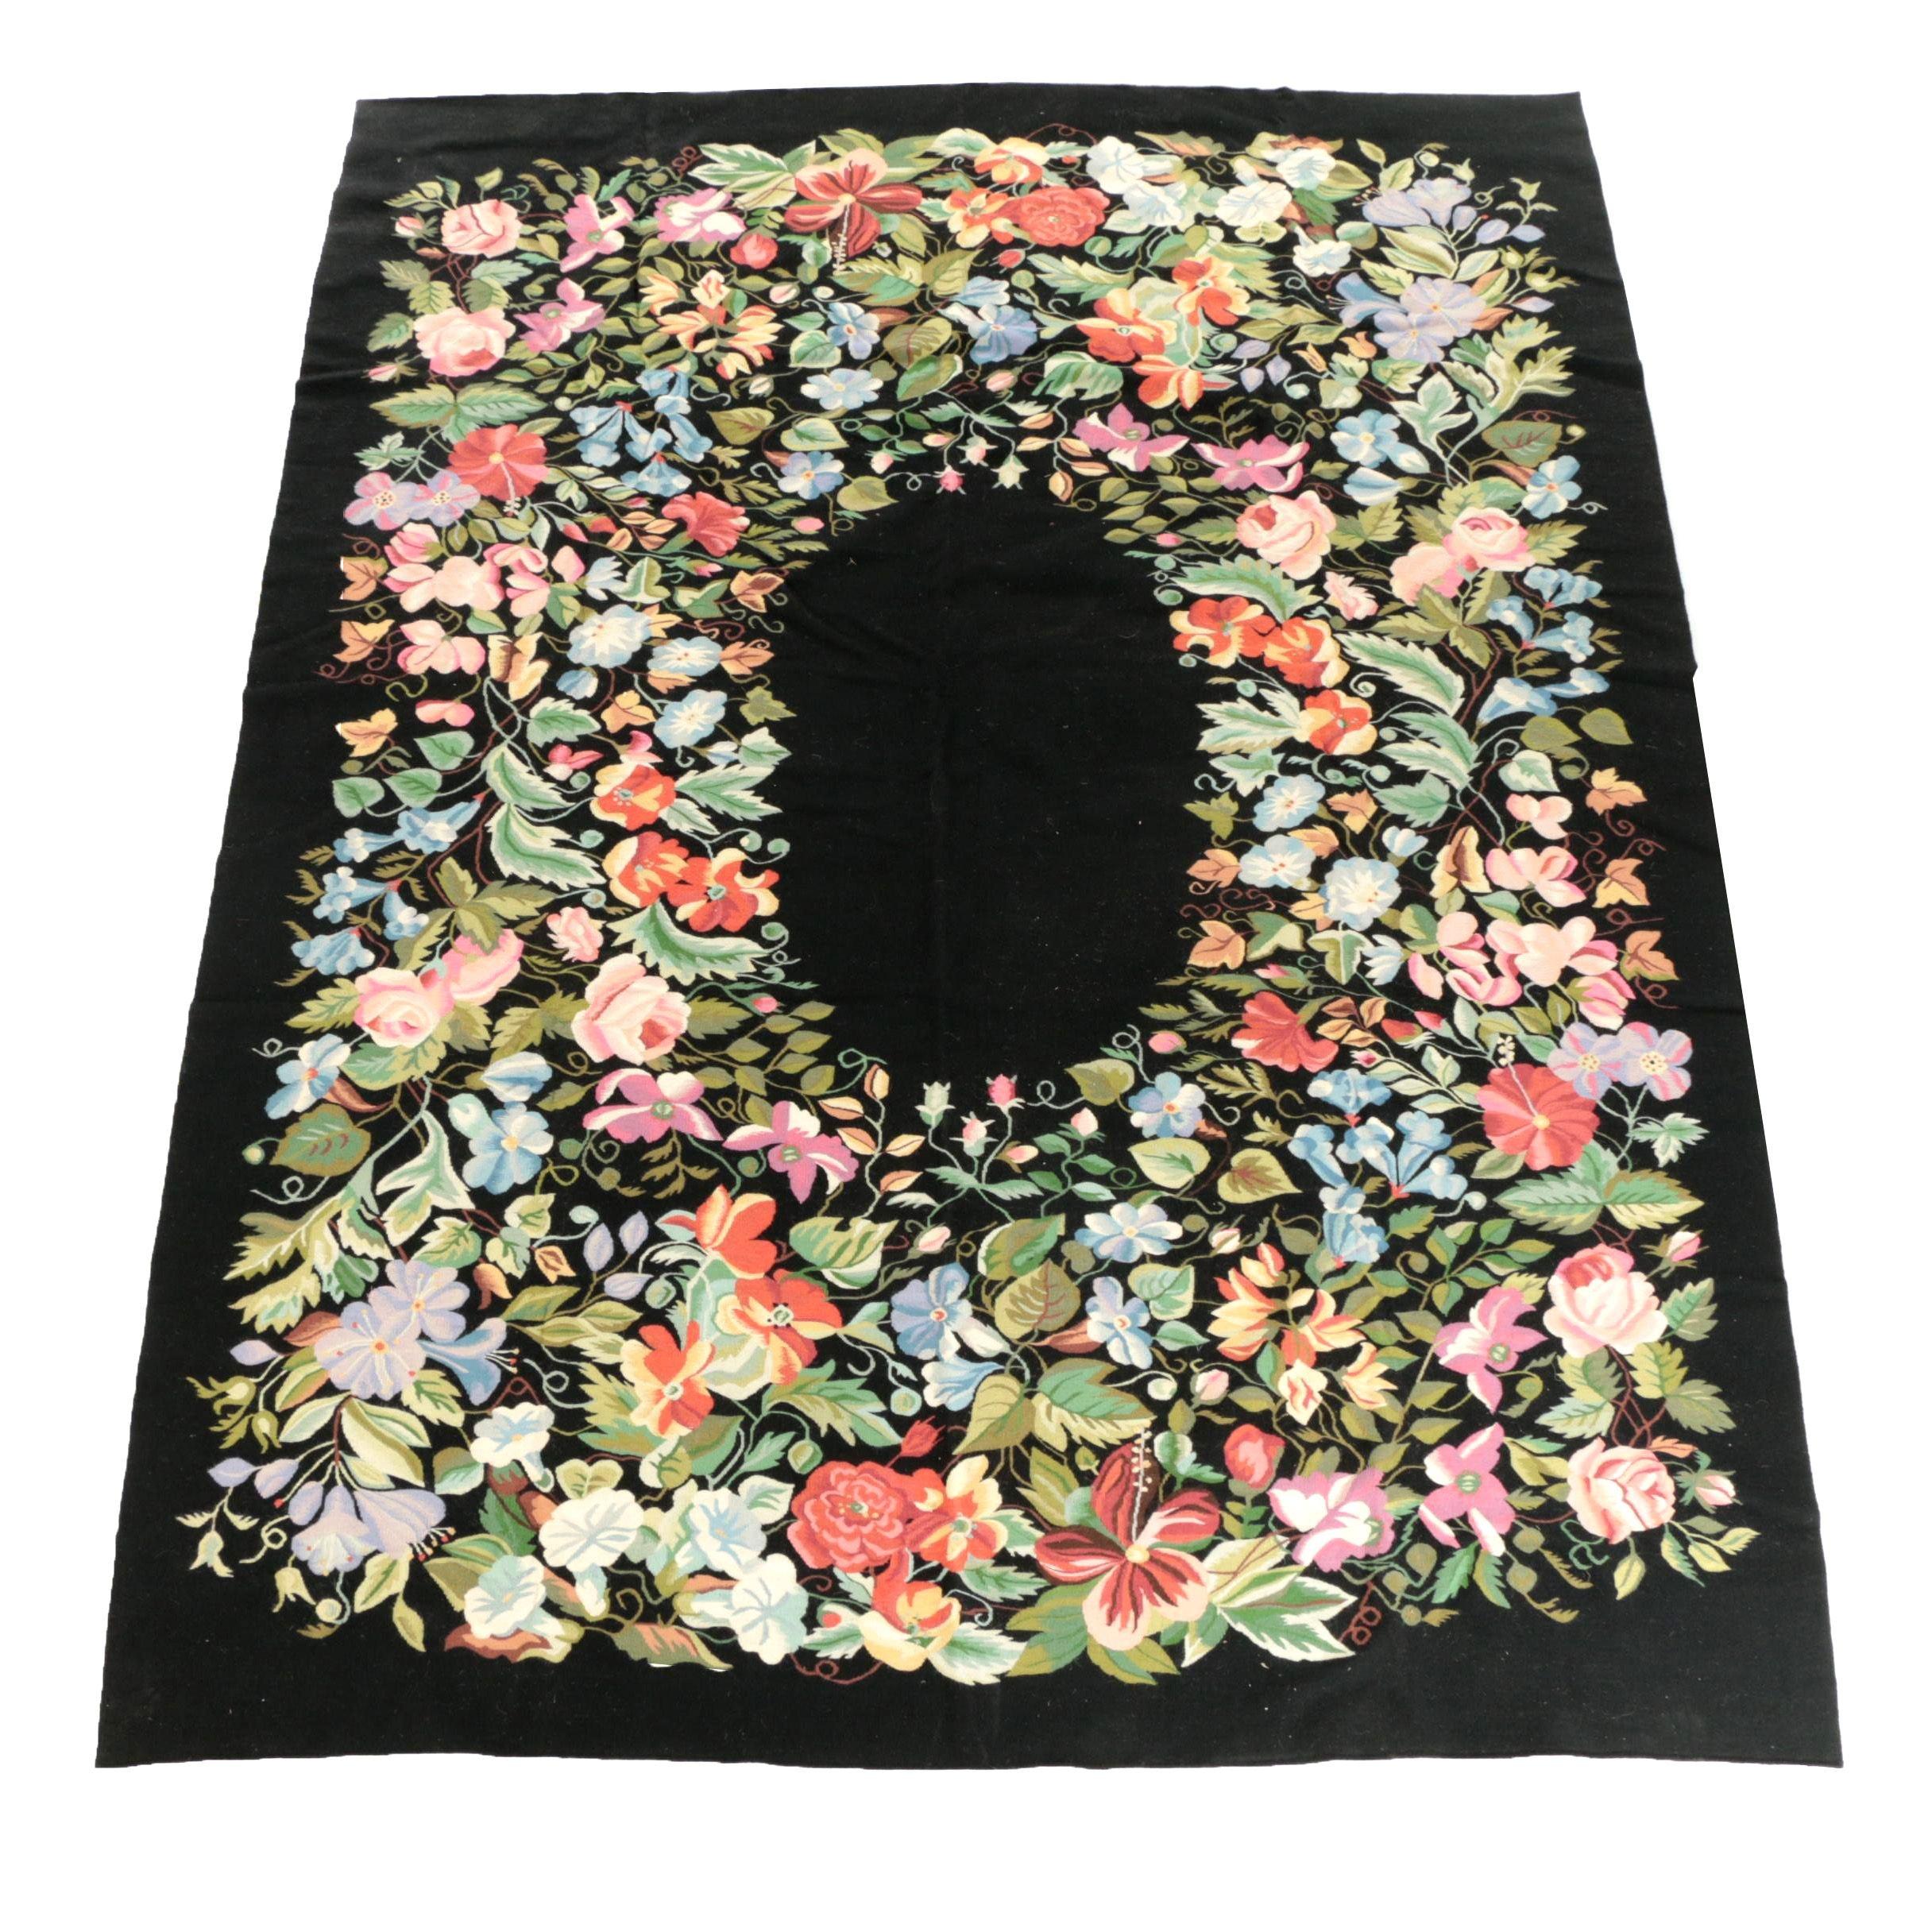 Vintage Handwoven Kilim Floral Wool Area Rug